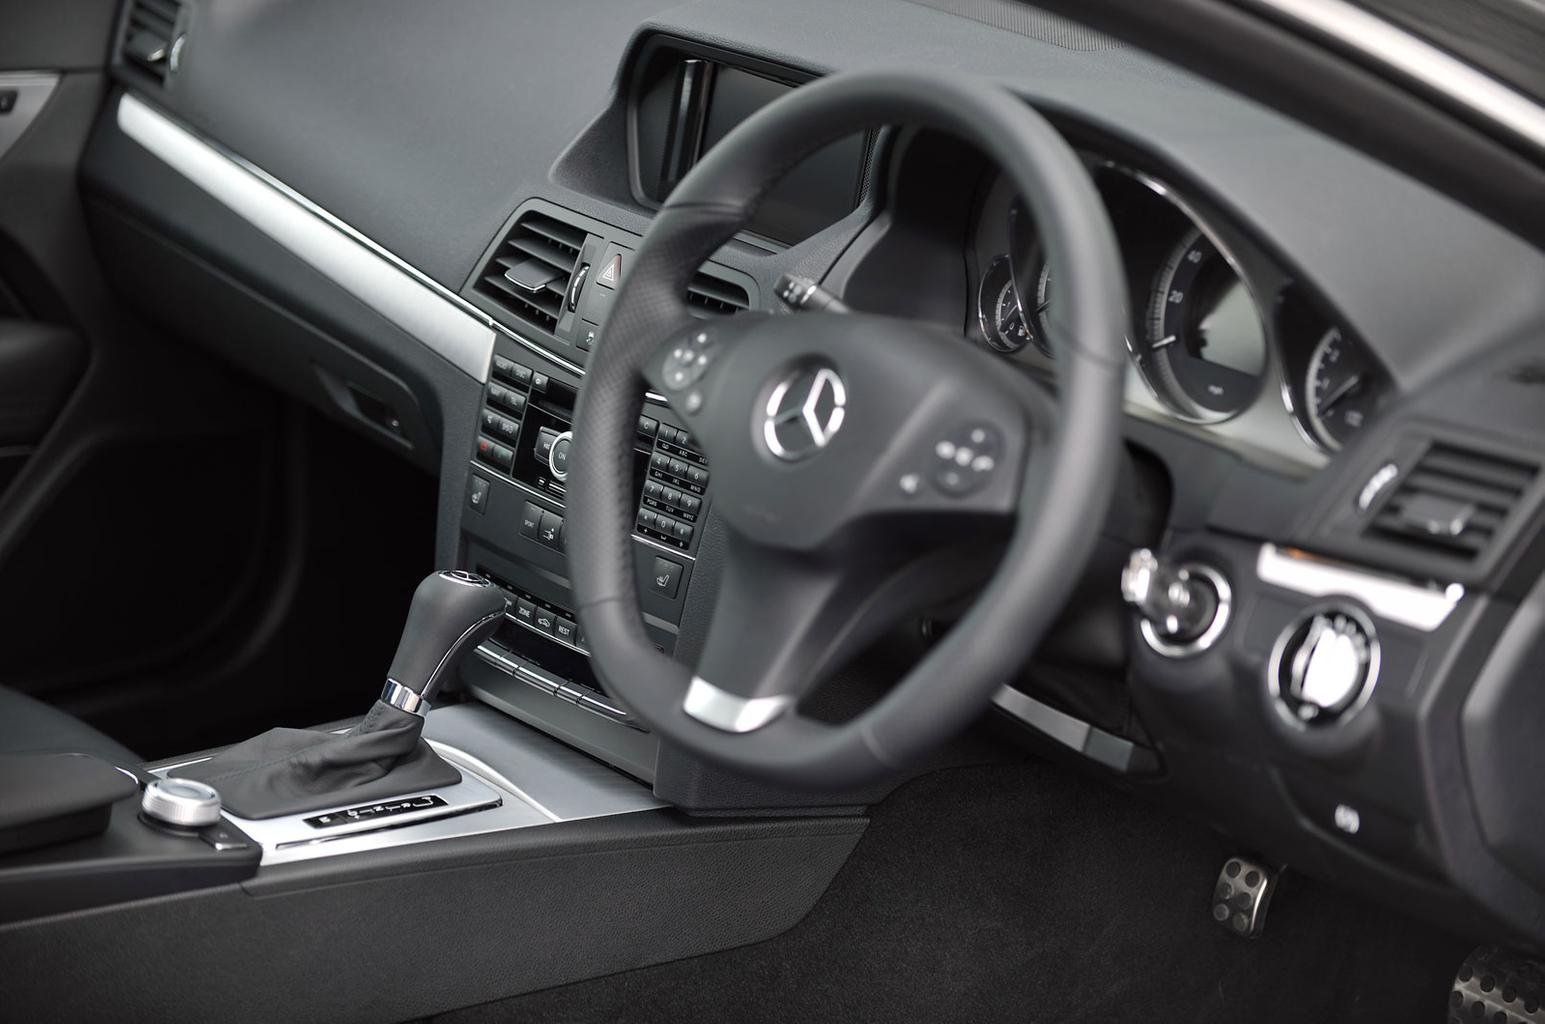 Mercedes-Benz E-Class saloon (2009-2016)